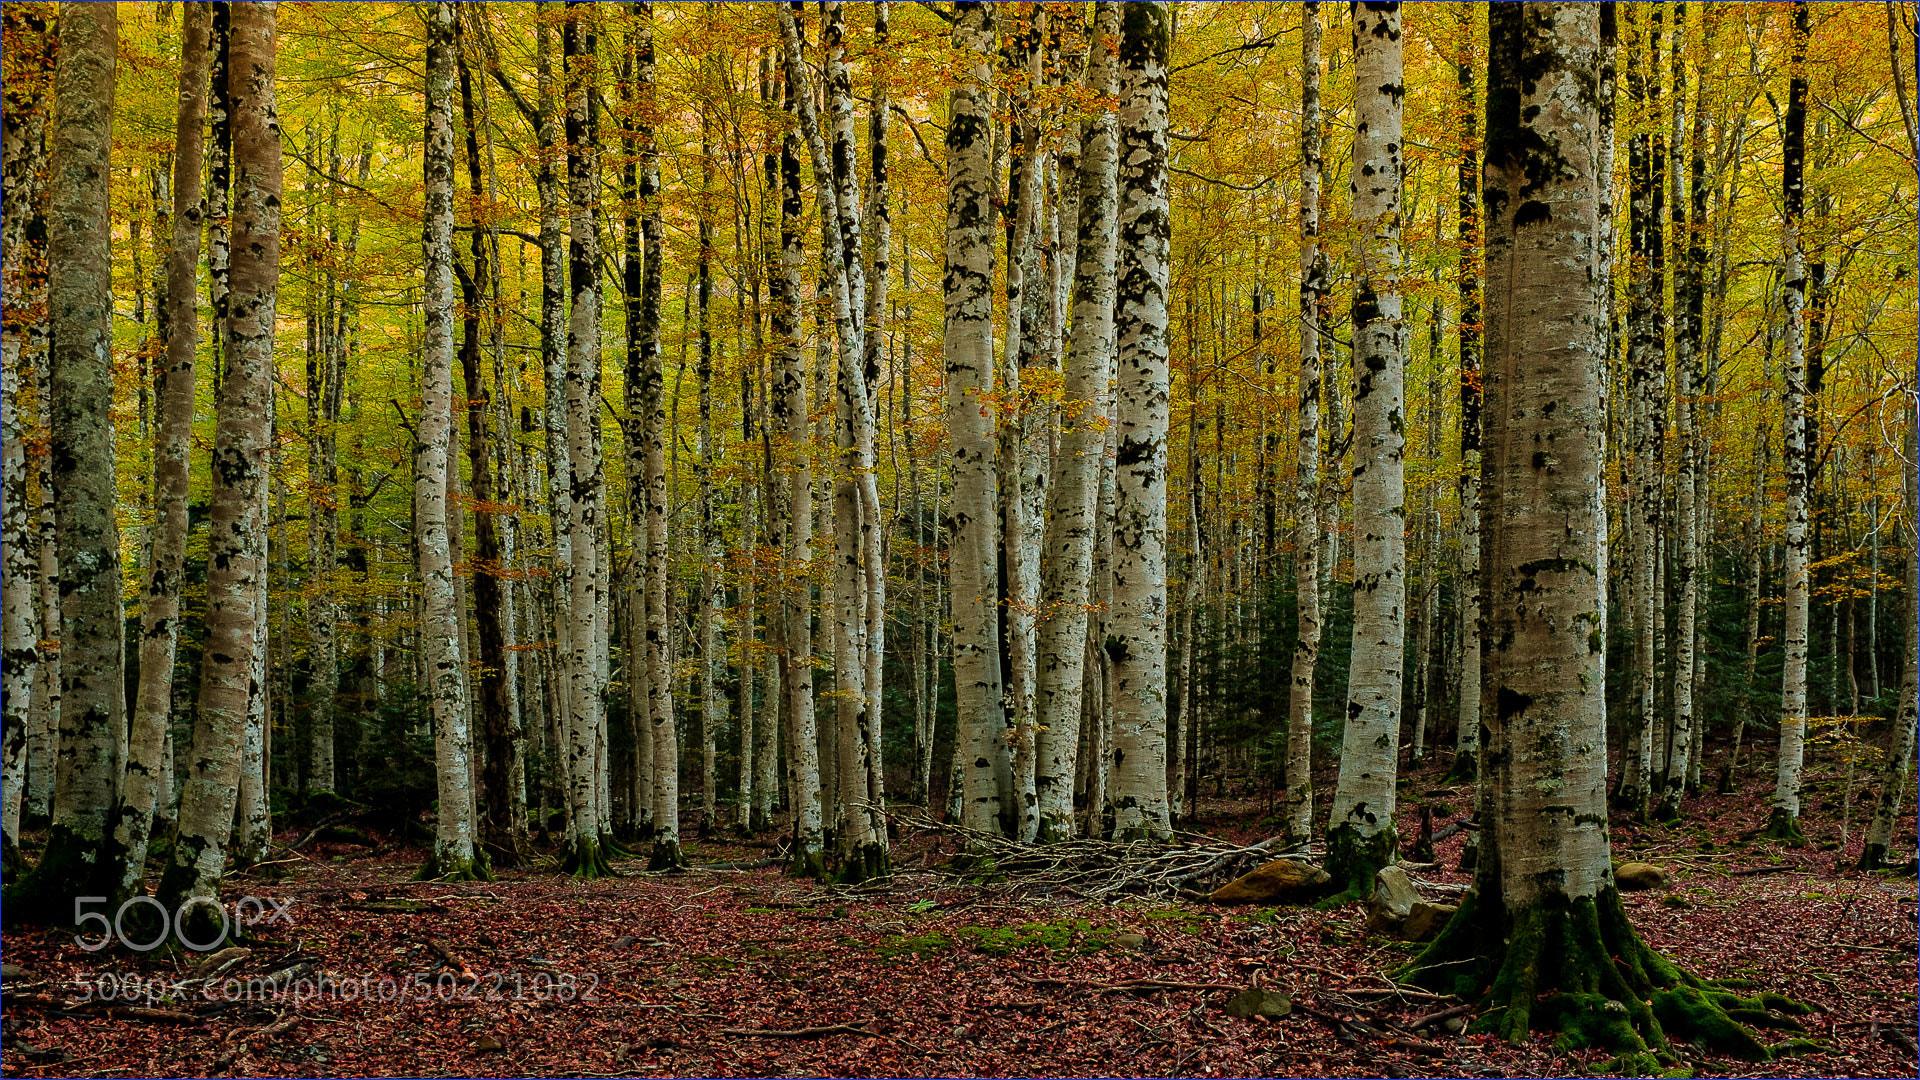 Photograph Otoño IV (Huesca) by Ferran Cartagena  on 500px